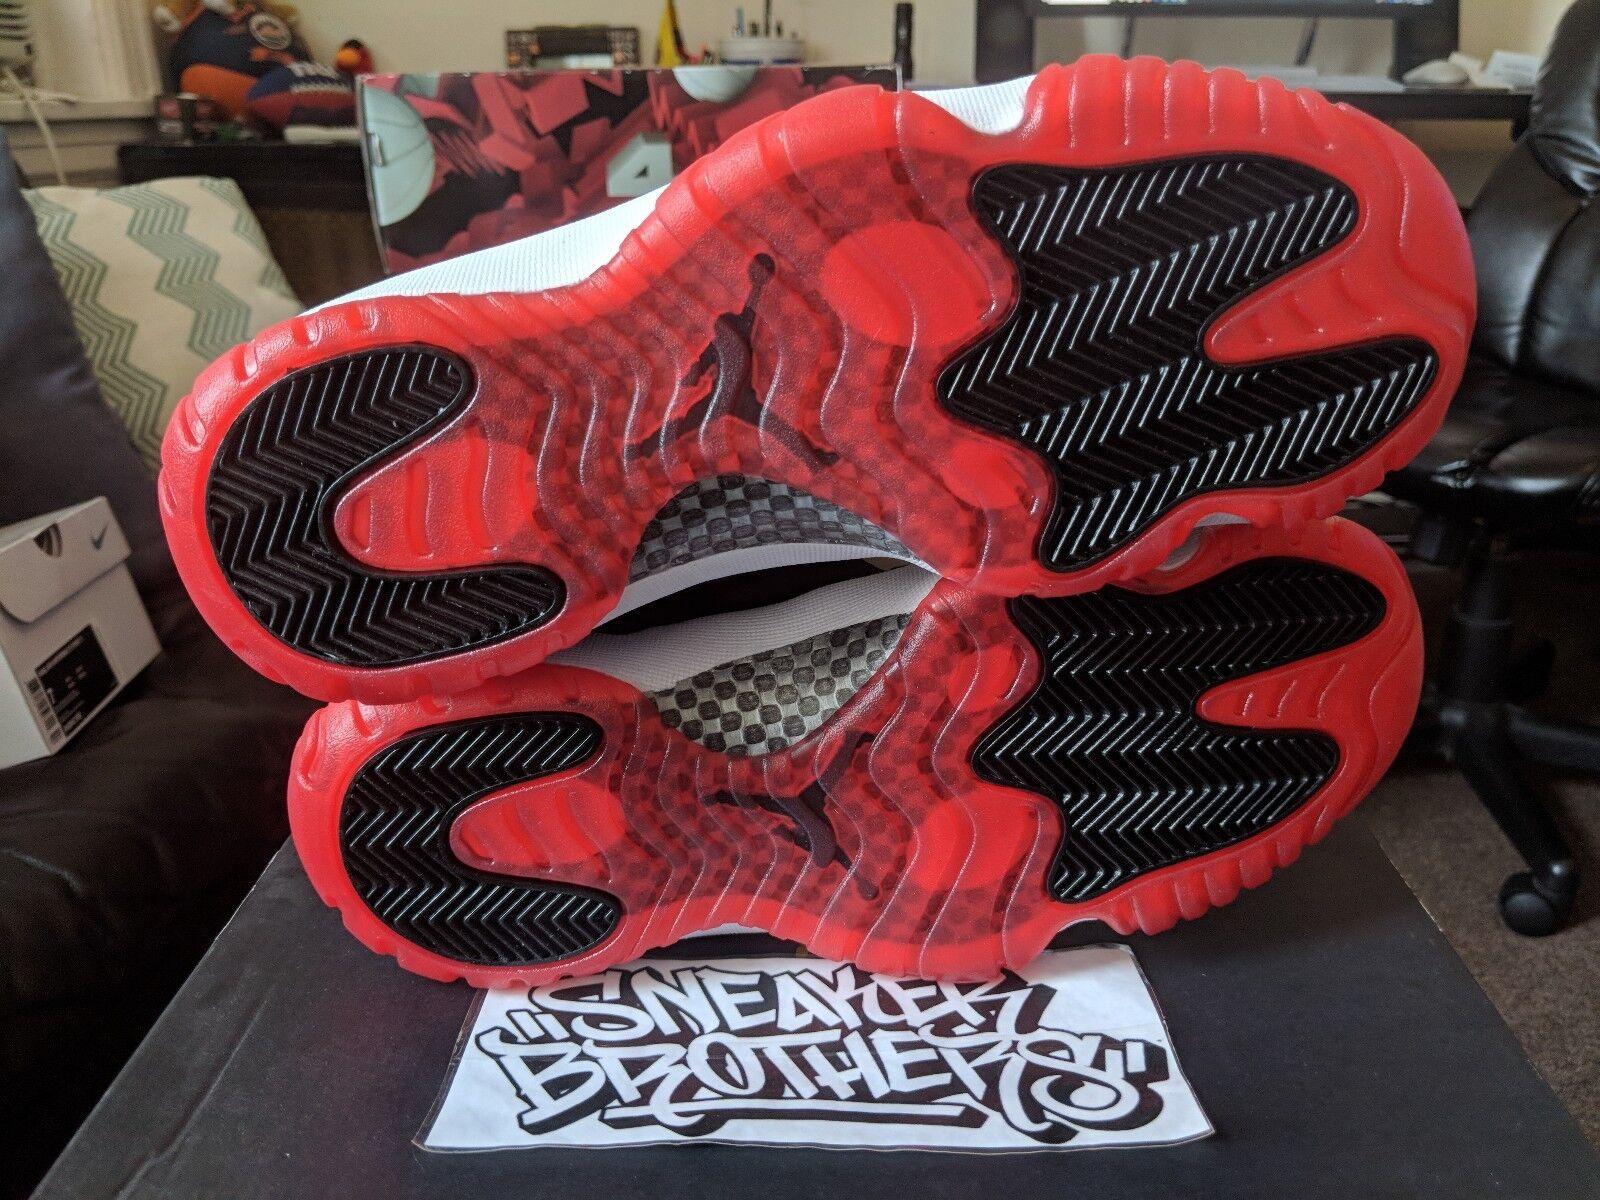 nike air jordan retro - xi 11 weiß niedrigen aus rot - weiß 11 - schwarzen wahr 528895-012 3b3b5d